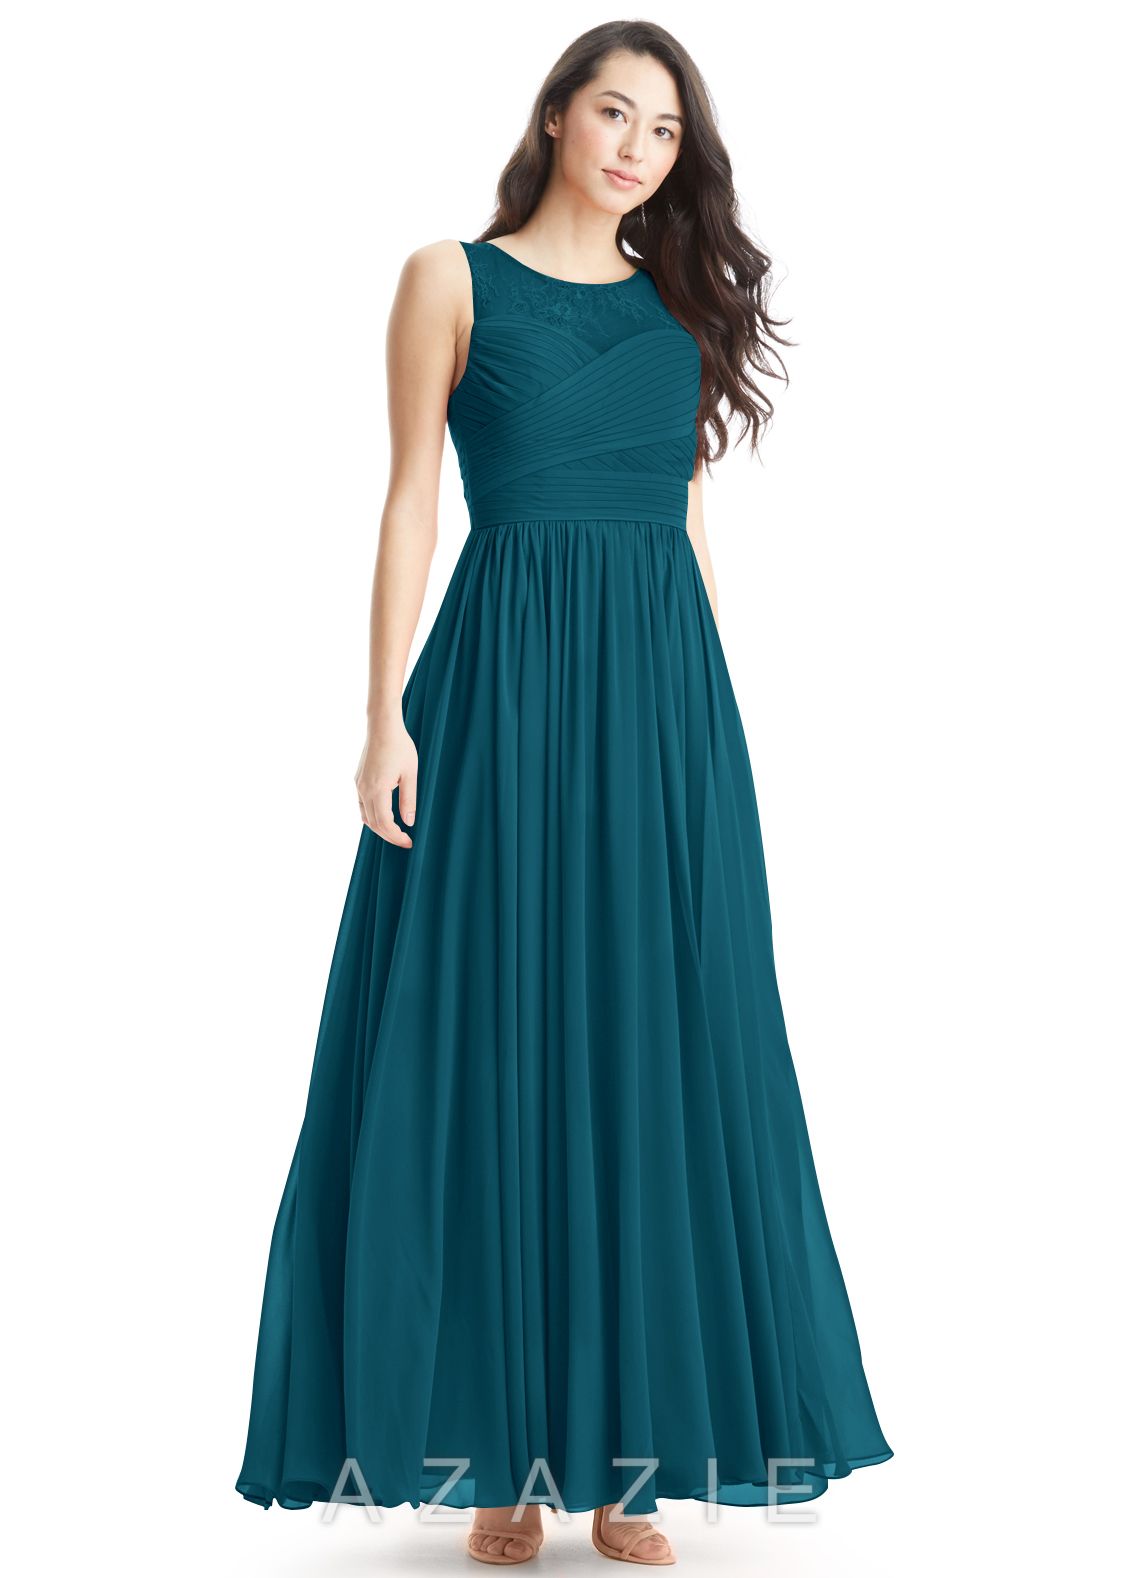 f6a9b7cefc9b Azazie Aliya Bridesmaid Dress - Ink Blue | Azazie